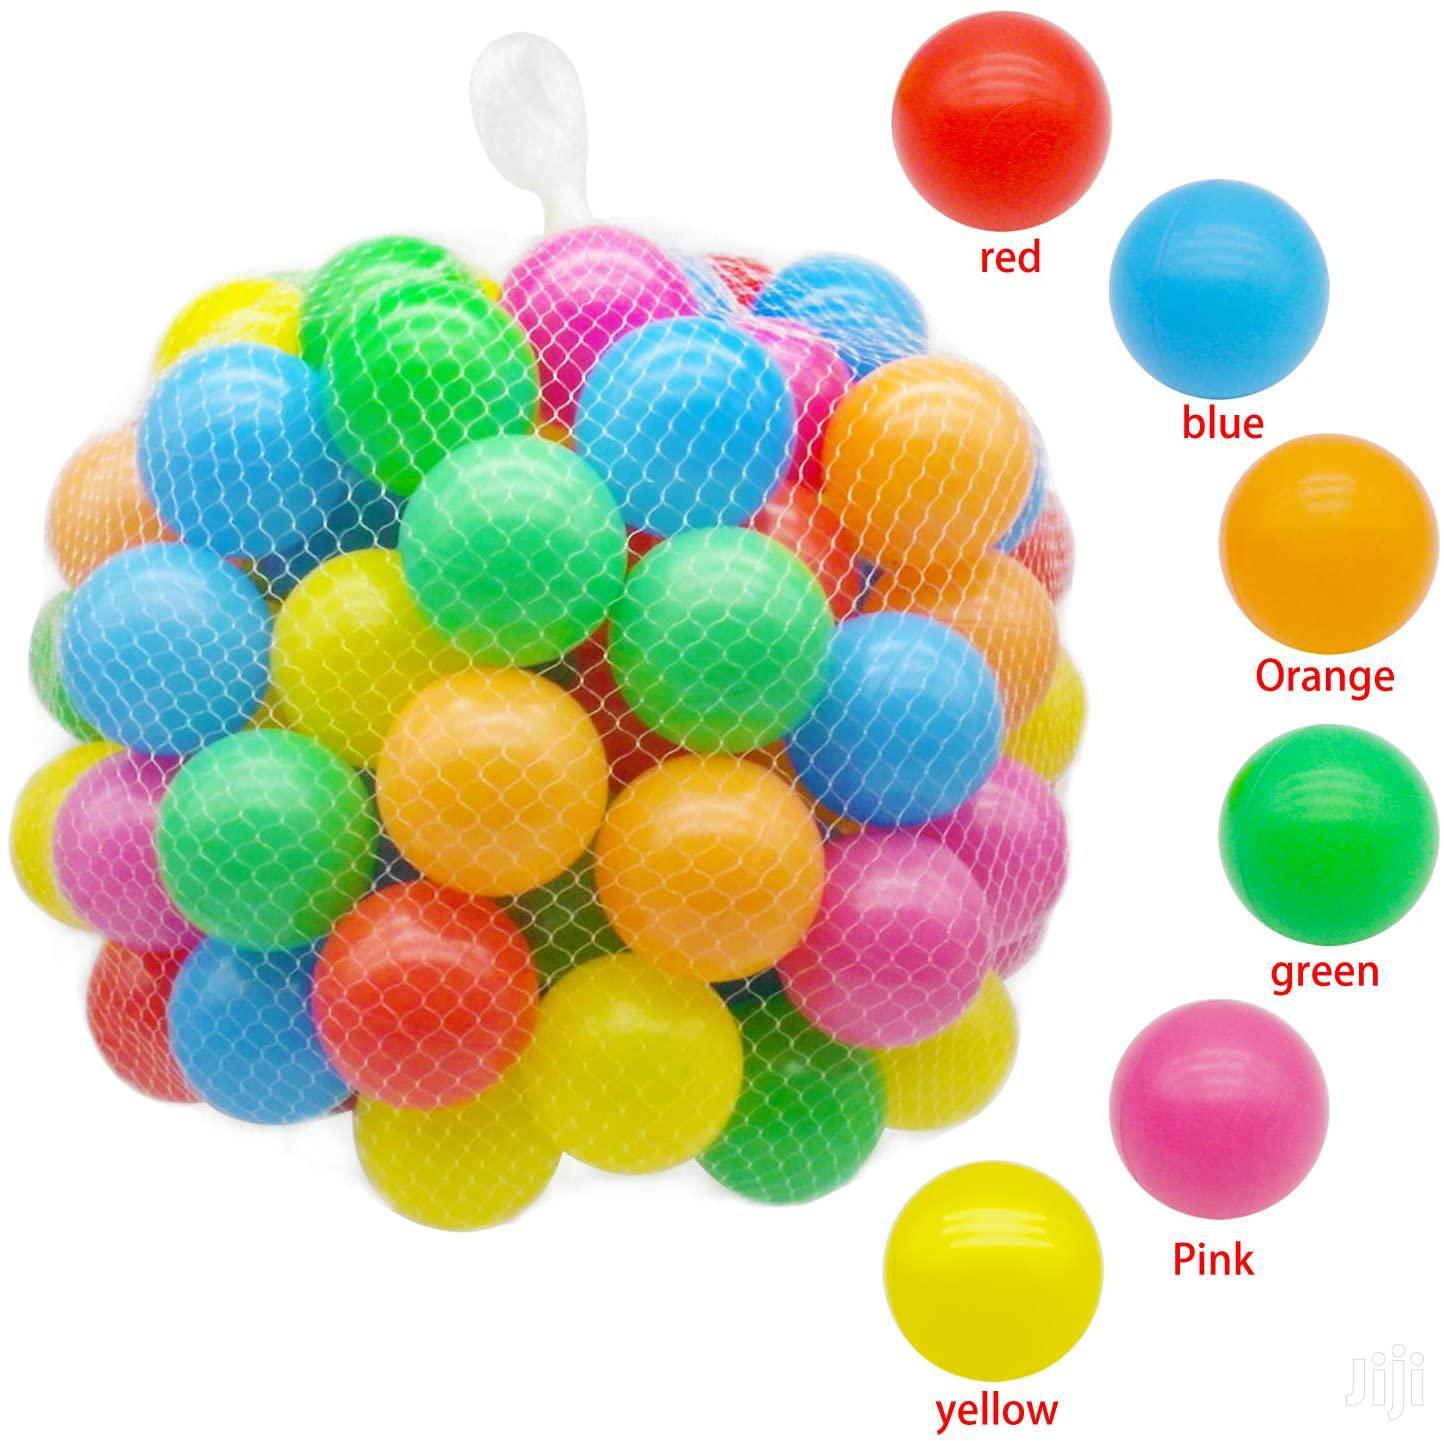 Colorful Kids Children Soft Plastic Play Pit Balls - 10 Pcs